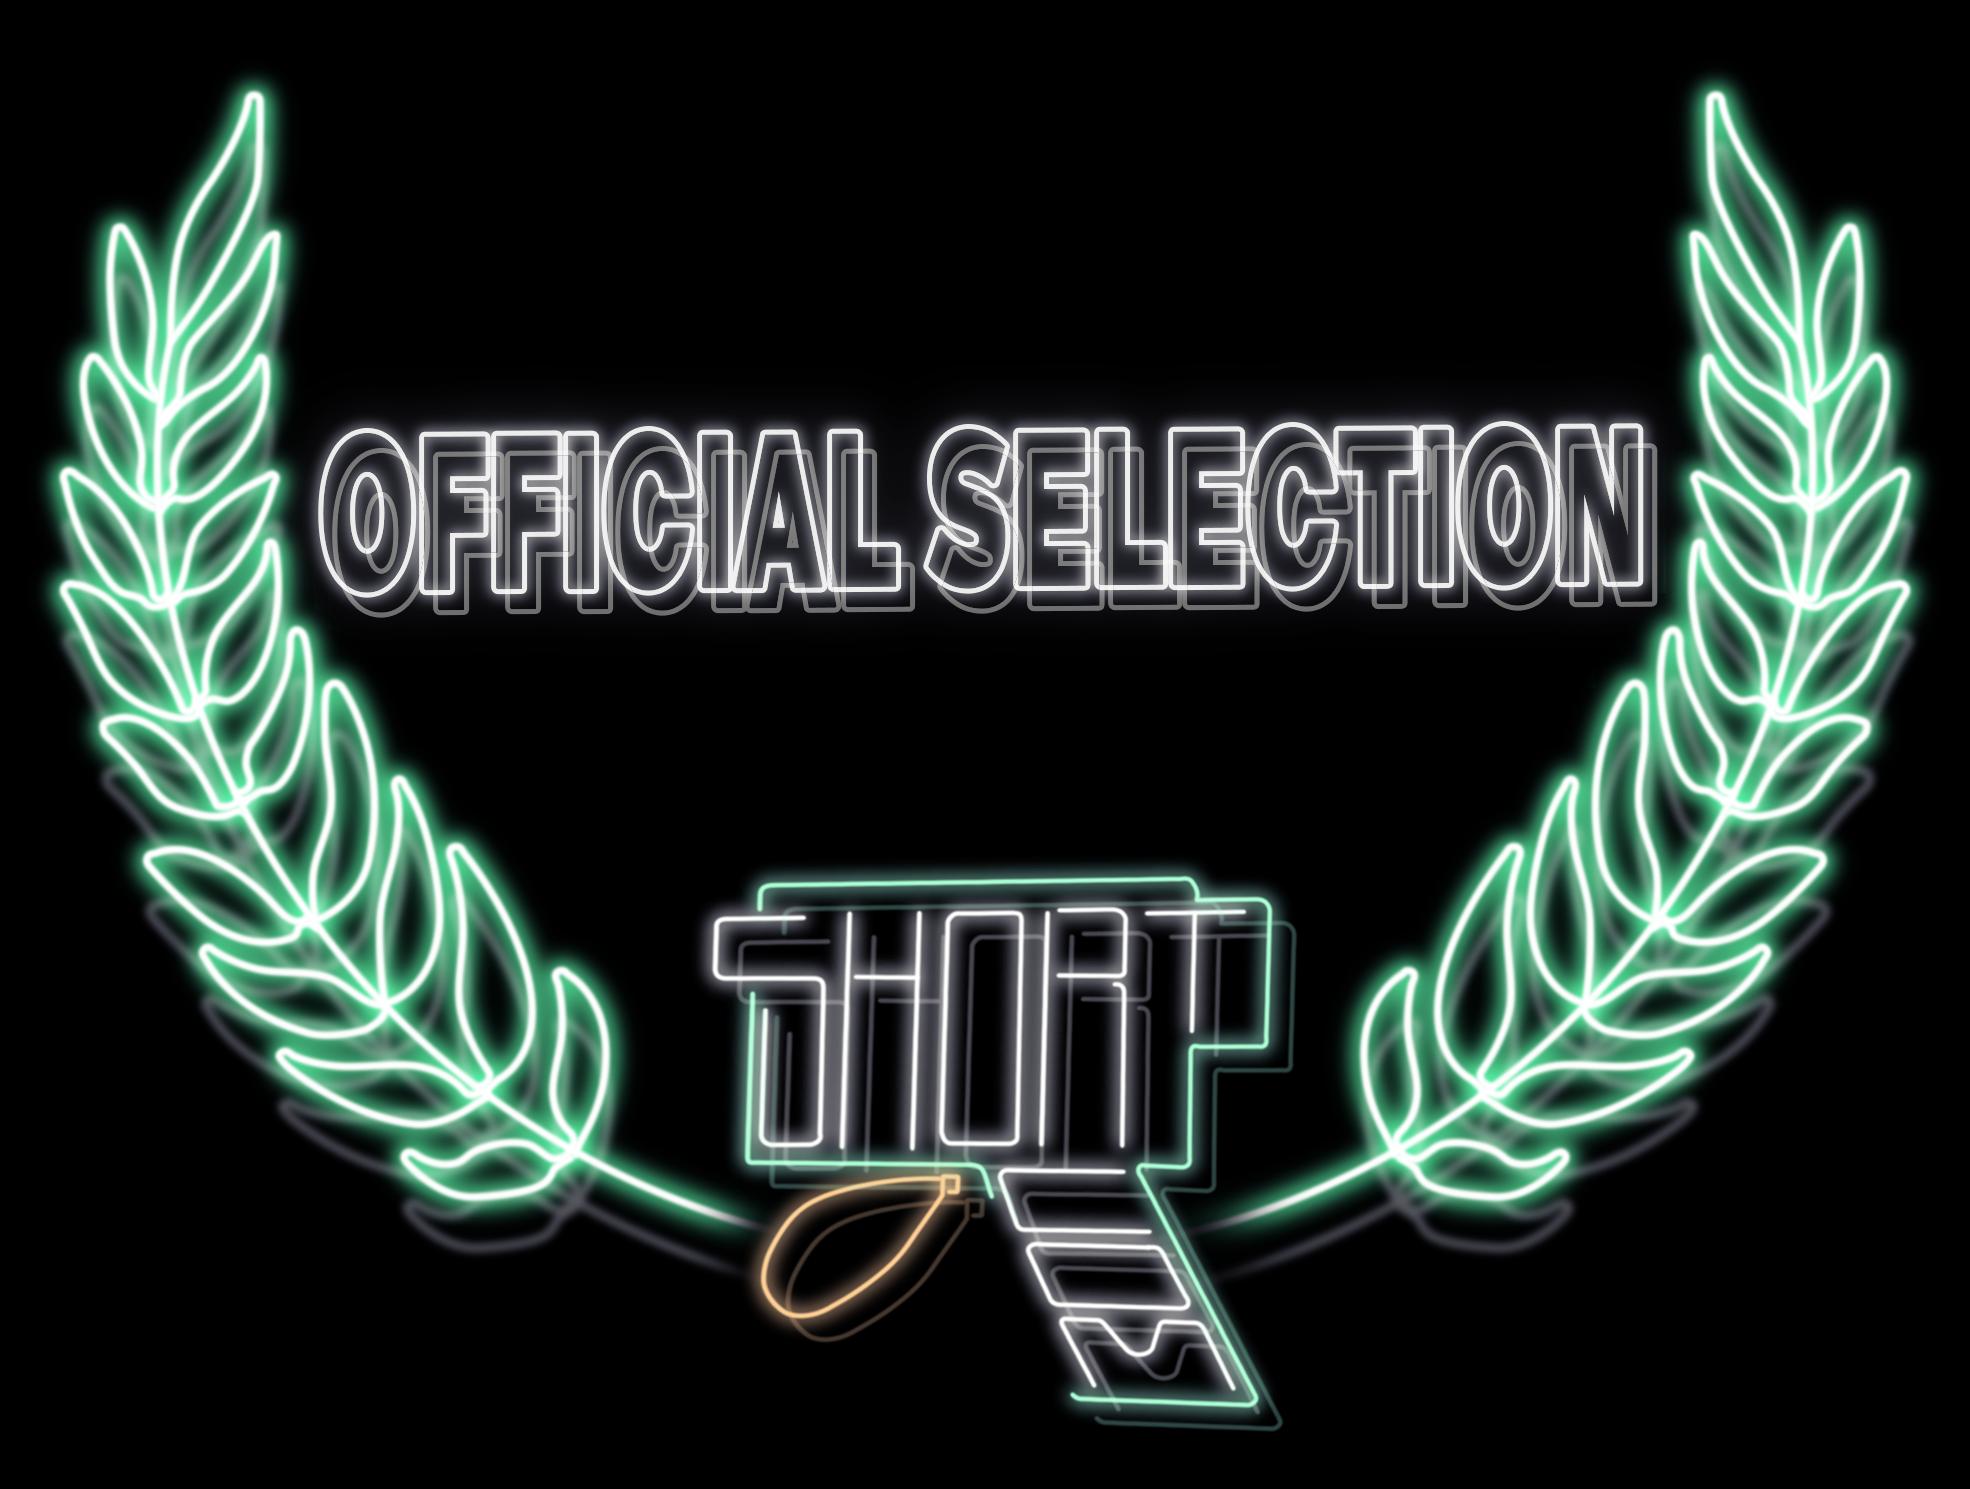 Shortcom Laurels - Official Selection (Black).png